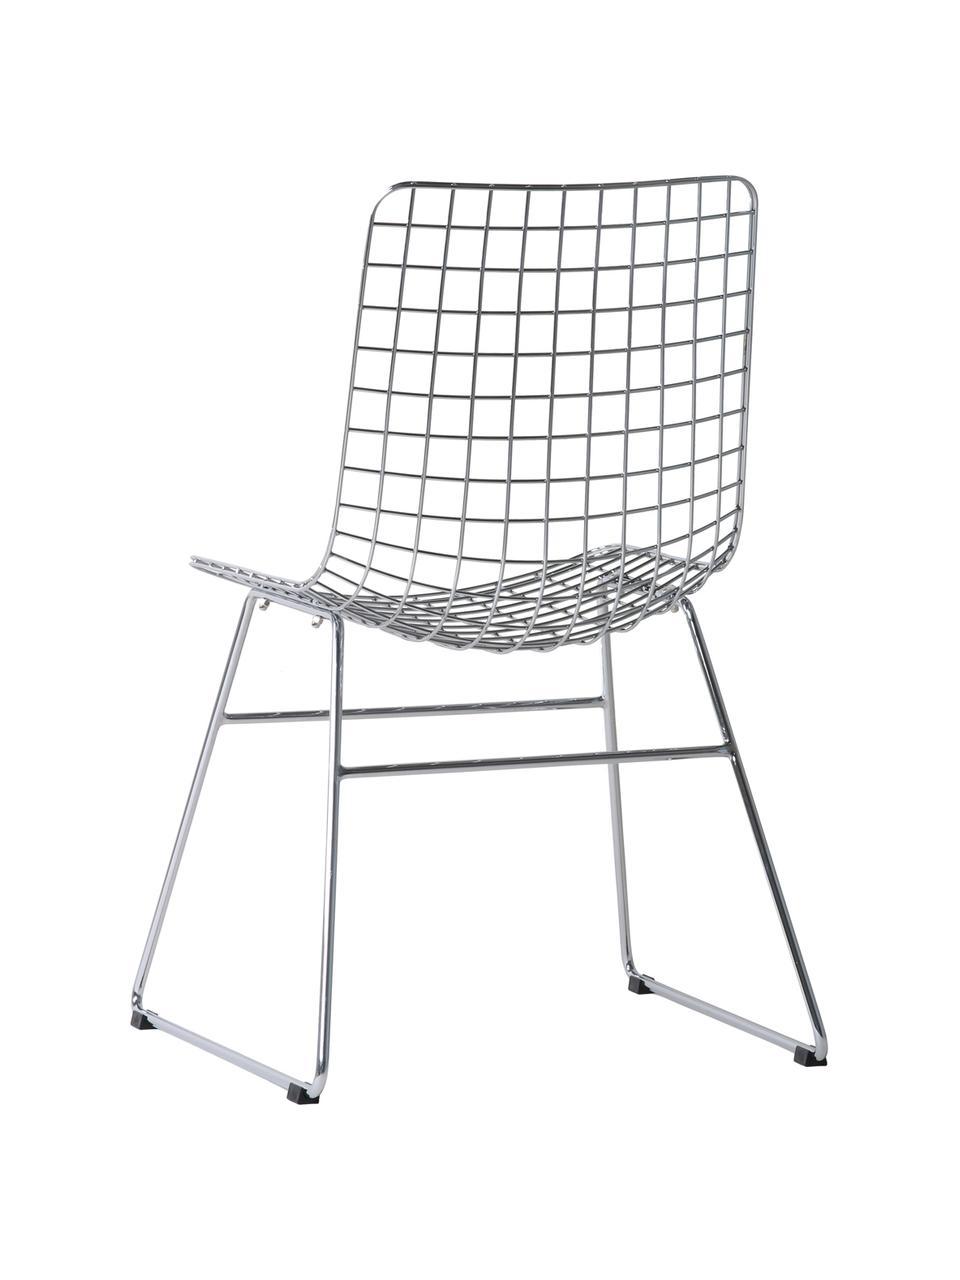 Metall-Stuhl Wire in Chrom, Metall, verchromt, Chrom, B 47 x T 54 cm